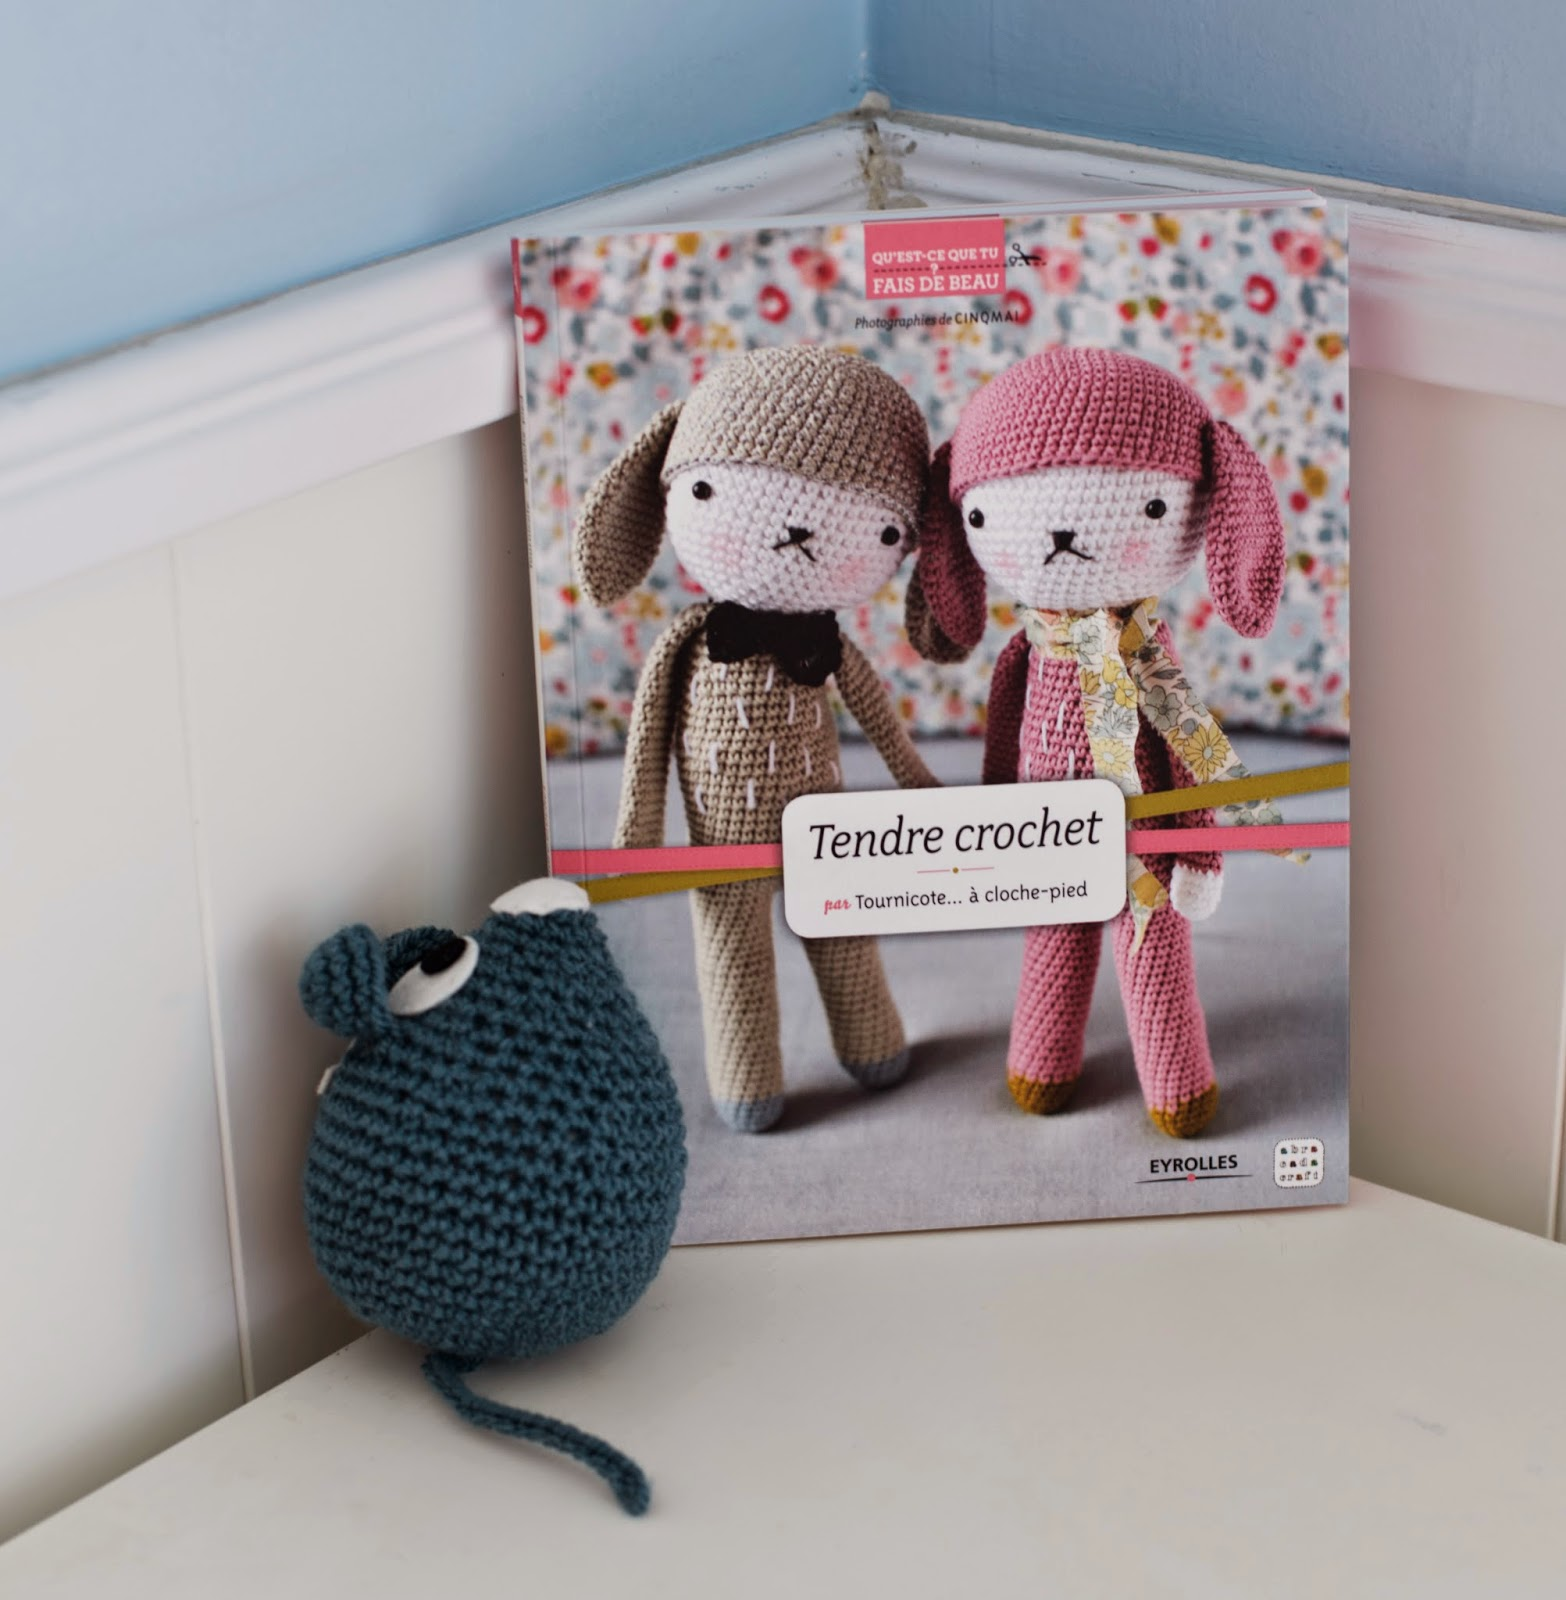 El Gallo Bermejo: Tendre crochet